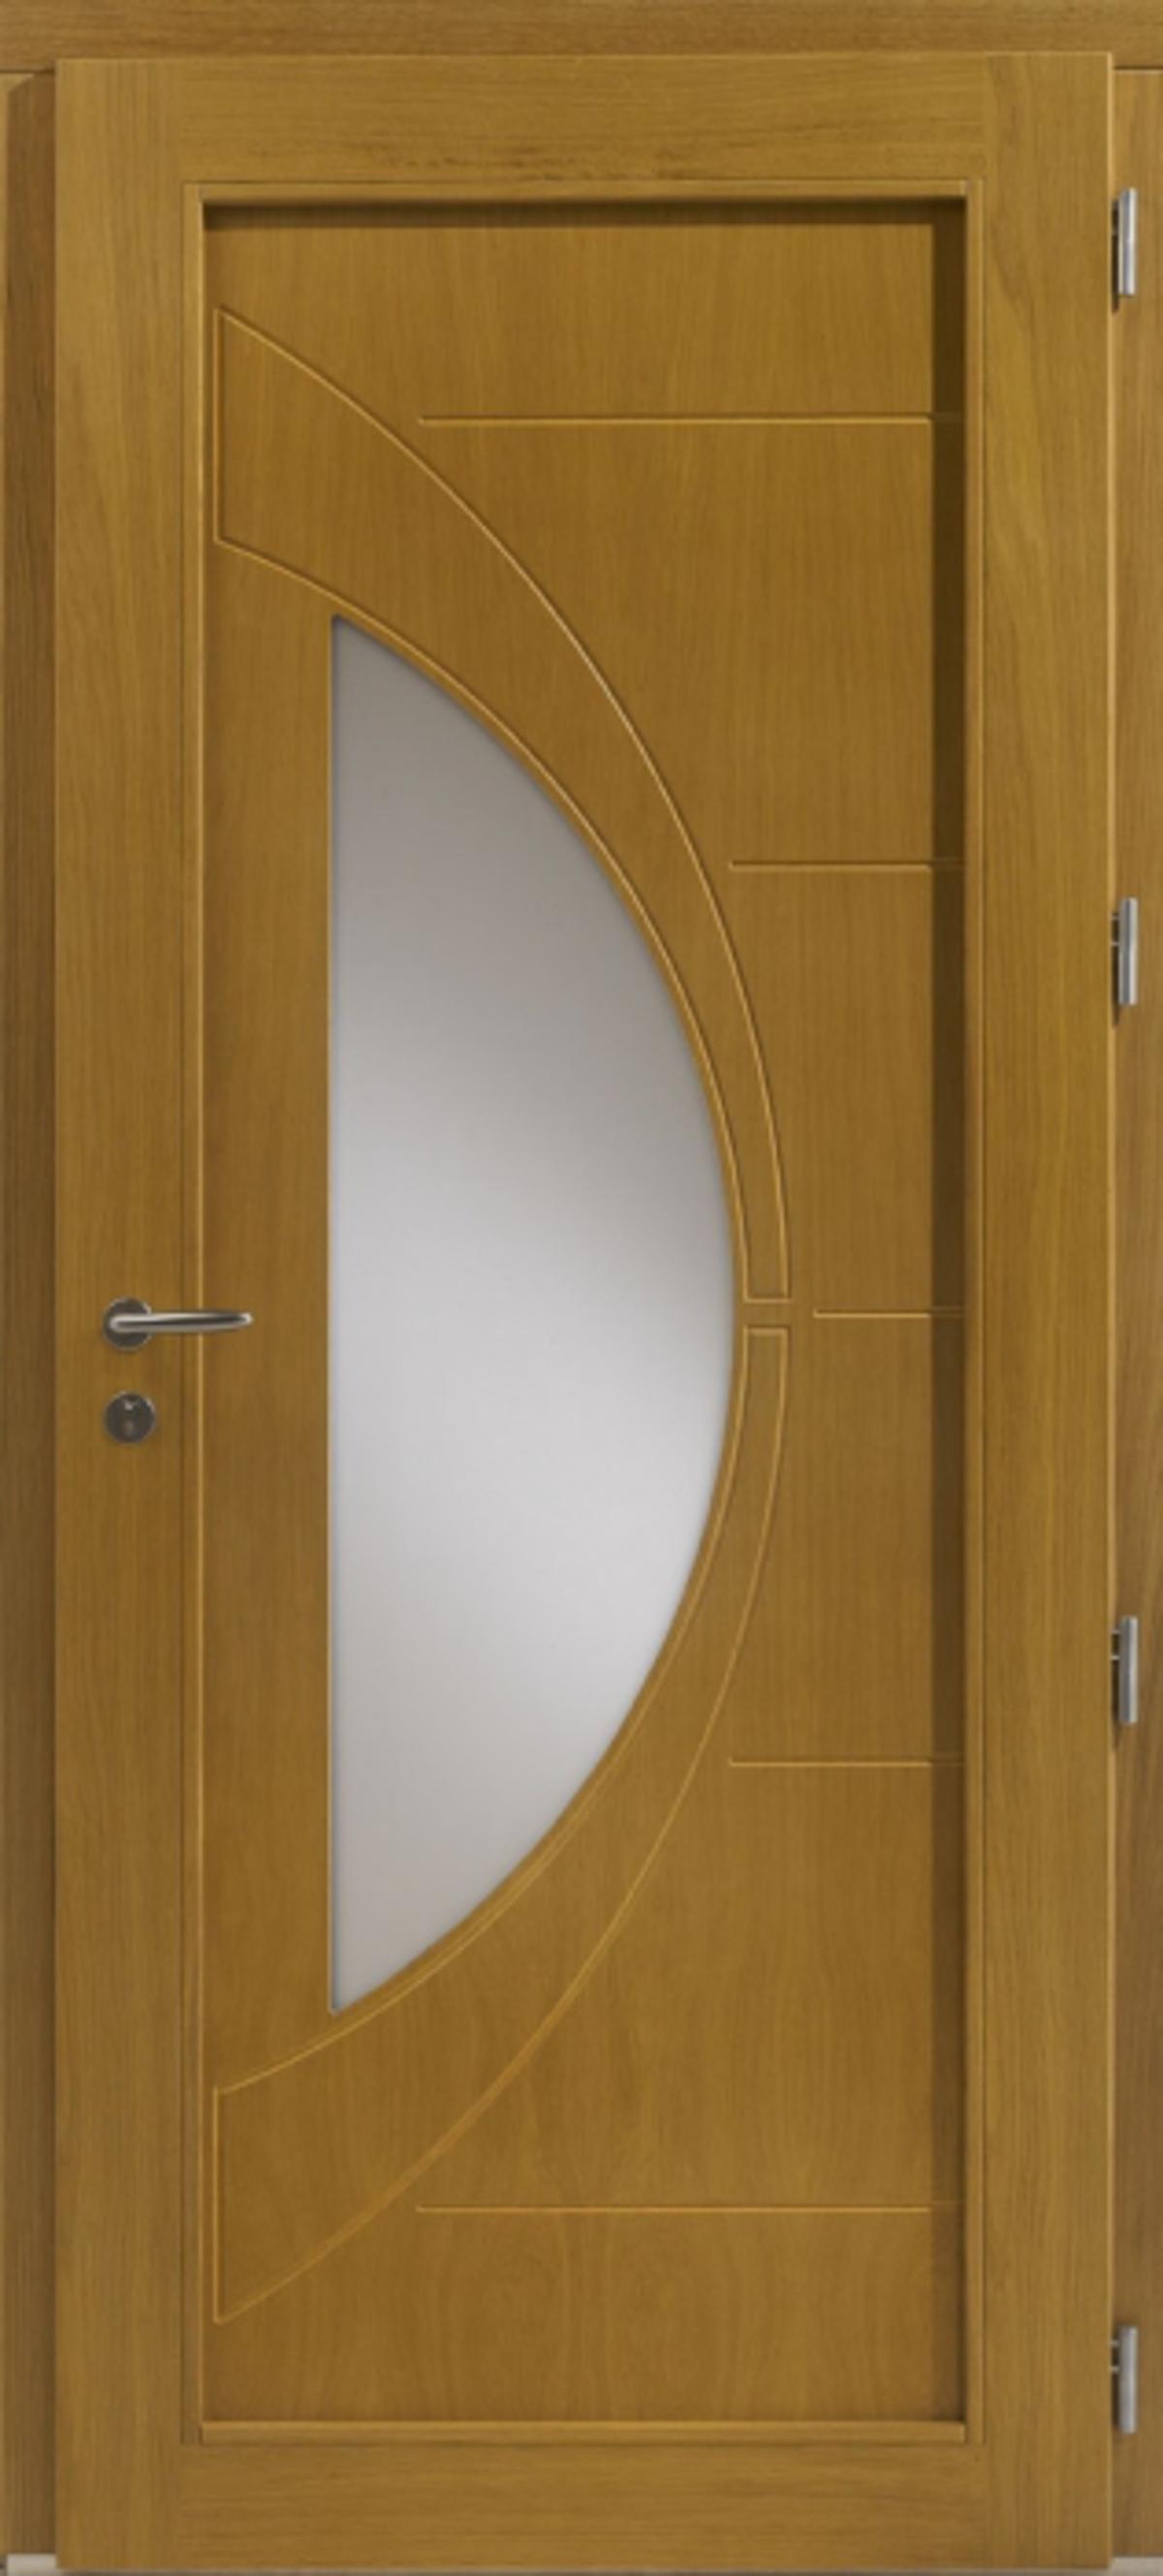 Fen tre facile porte d 39 entr e mixte bois alu mod le - Porte d entree mixte alu bois ...